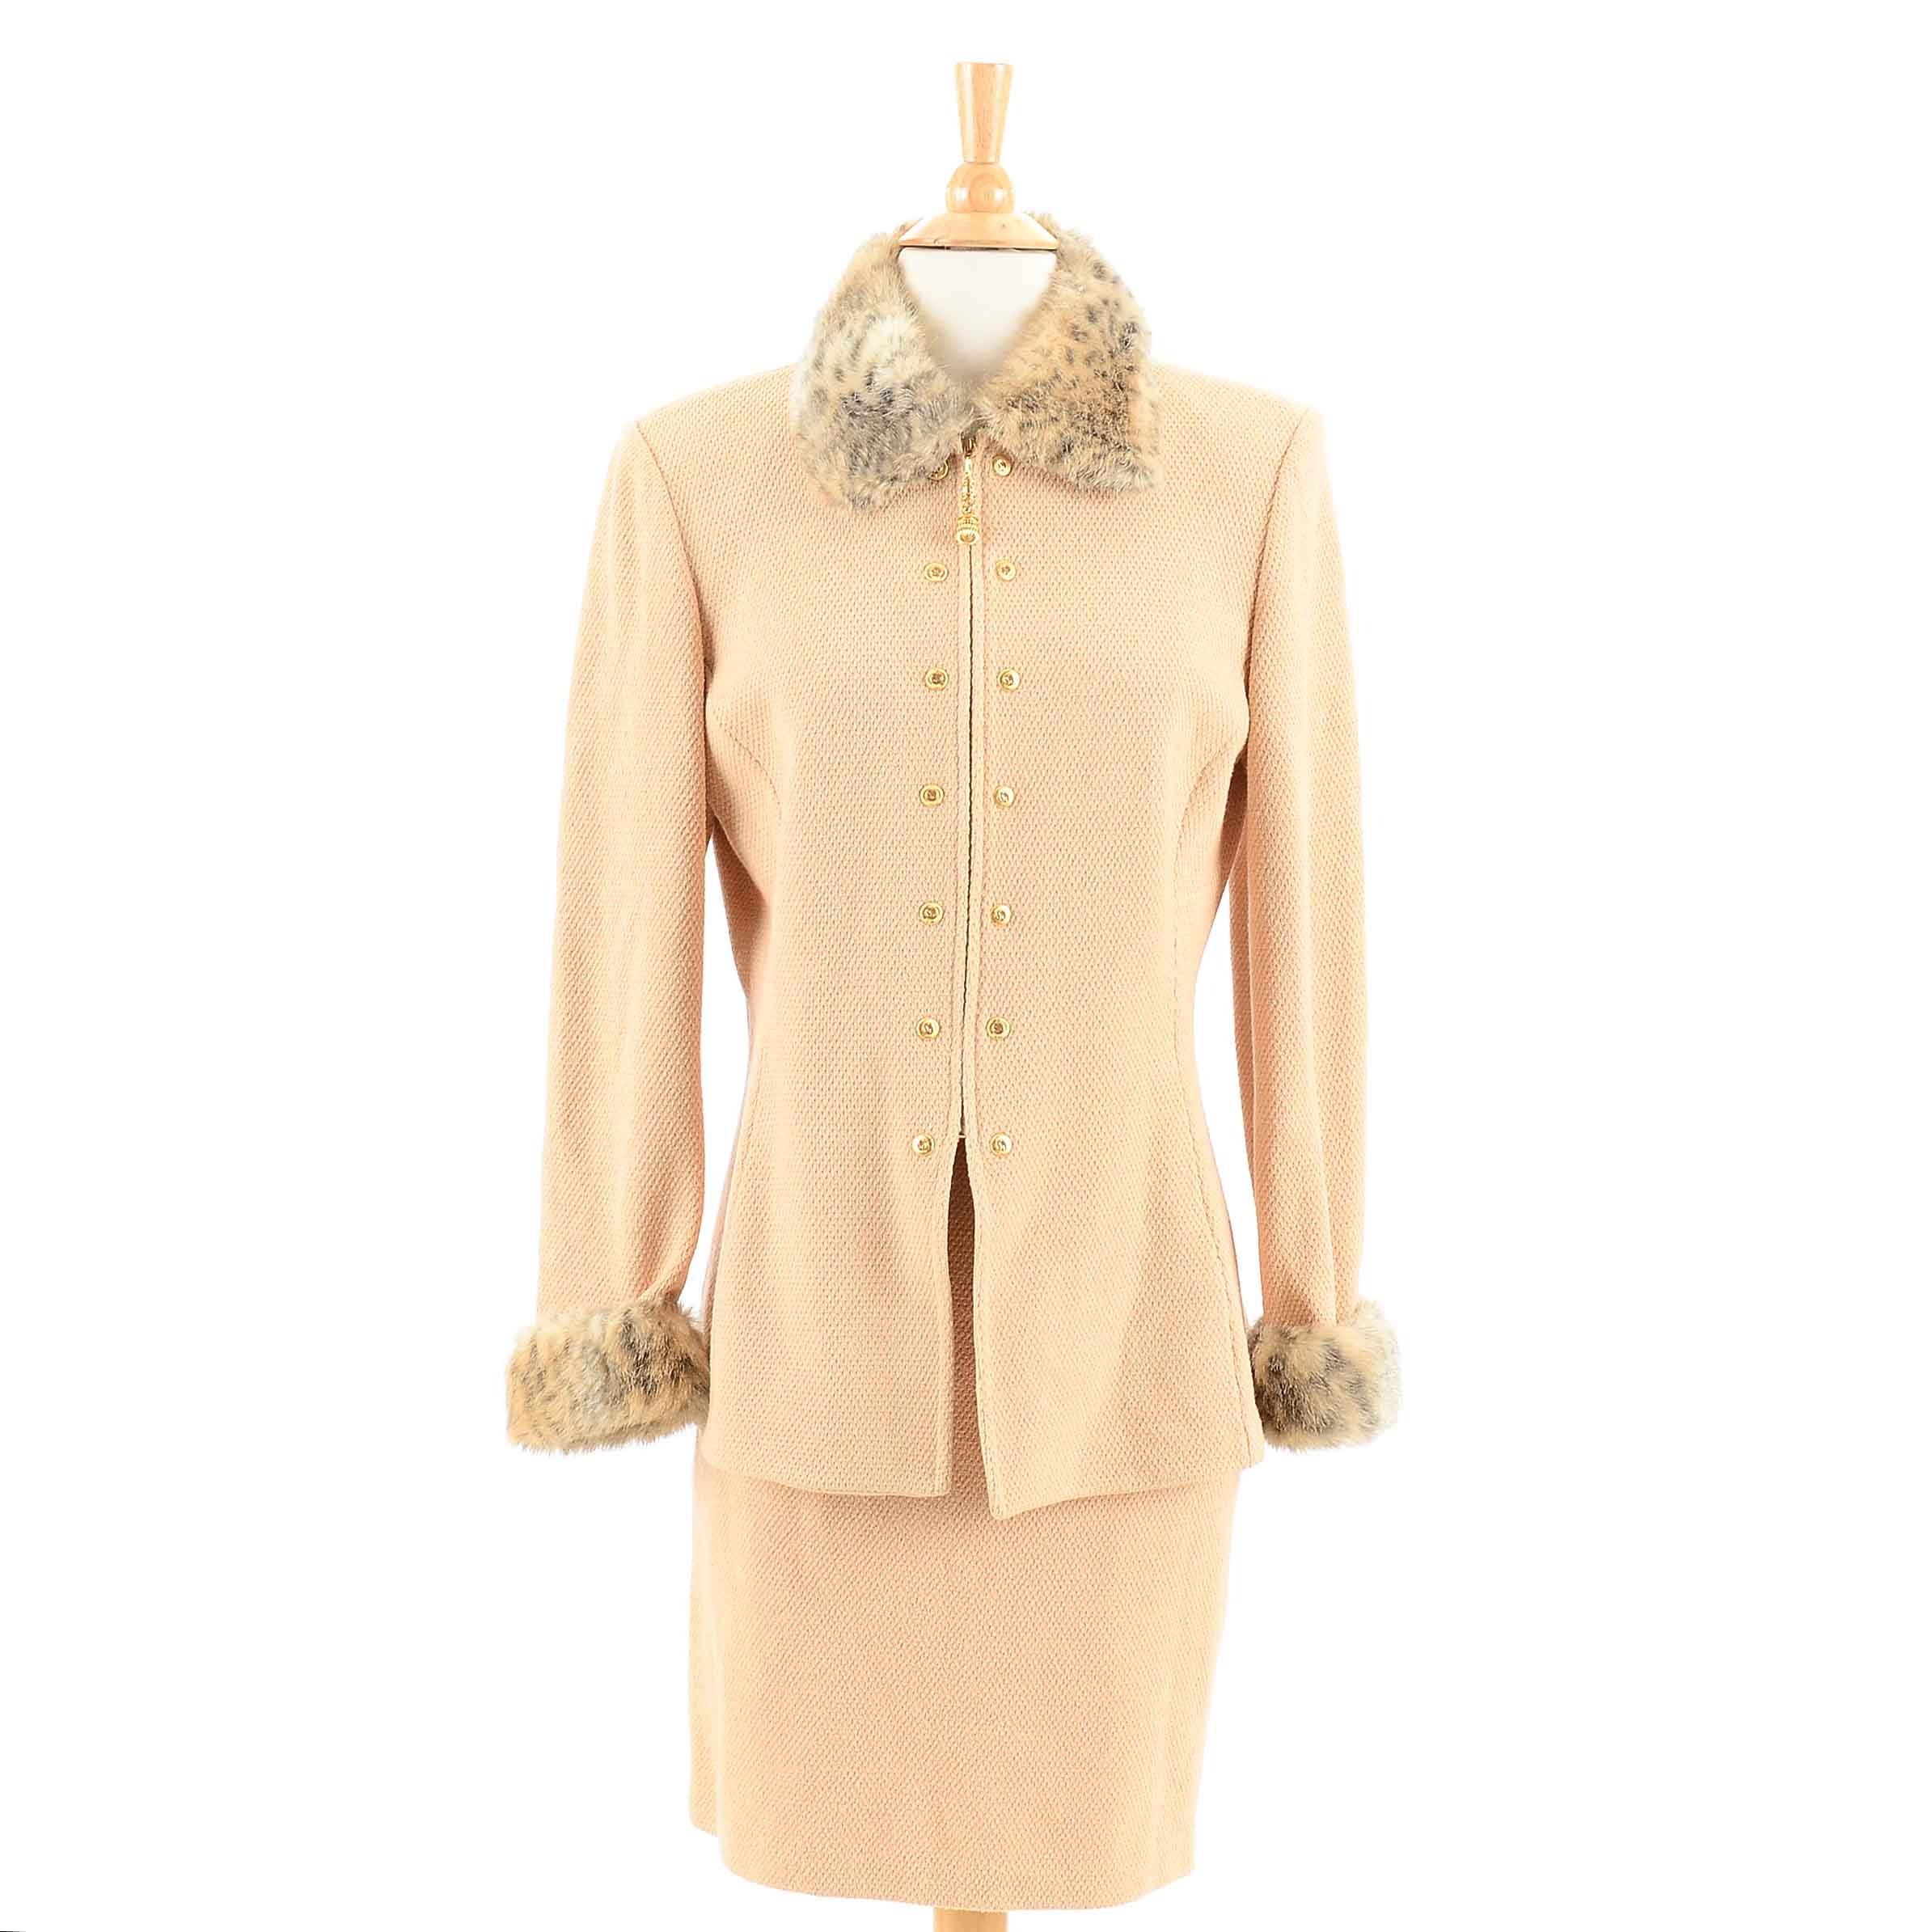 St. John Wheat Knit Suit with Removeable Faux Leopard Fur Collar